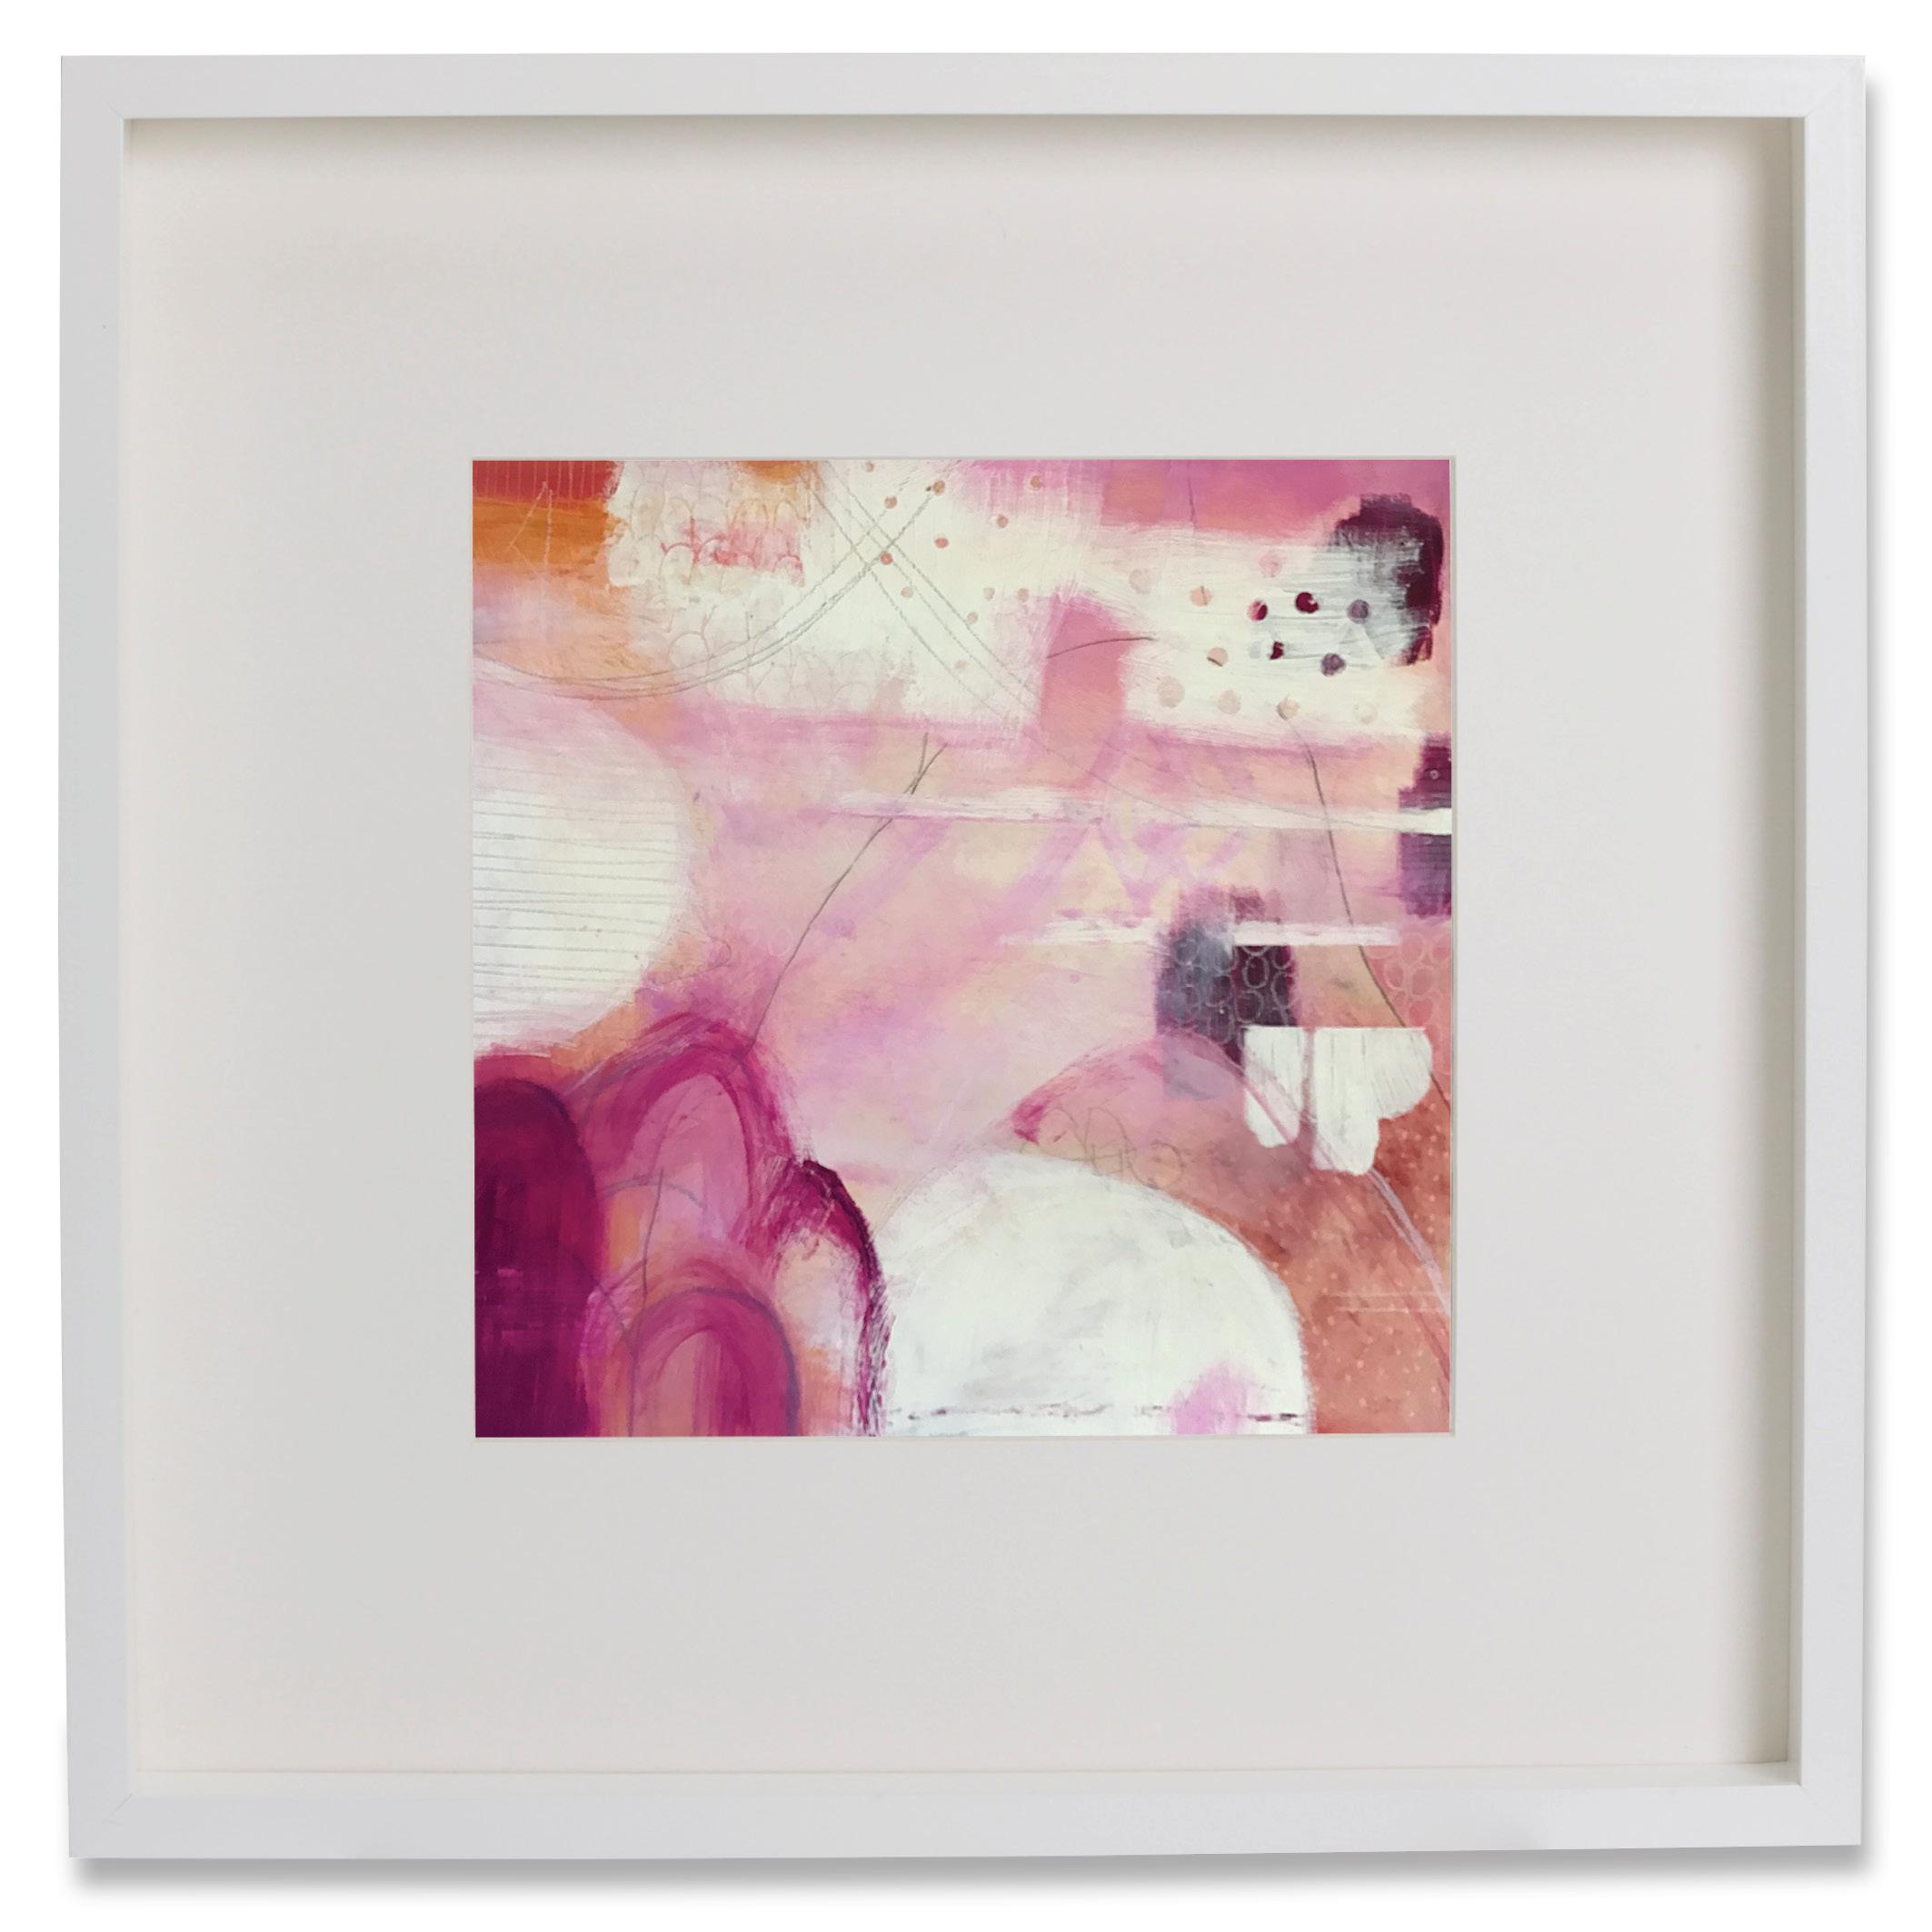 30cm x 30cm Acrylic paint on board   $90 UNFRAMED  plus postage